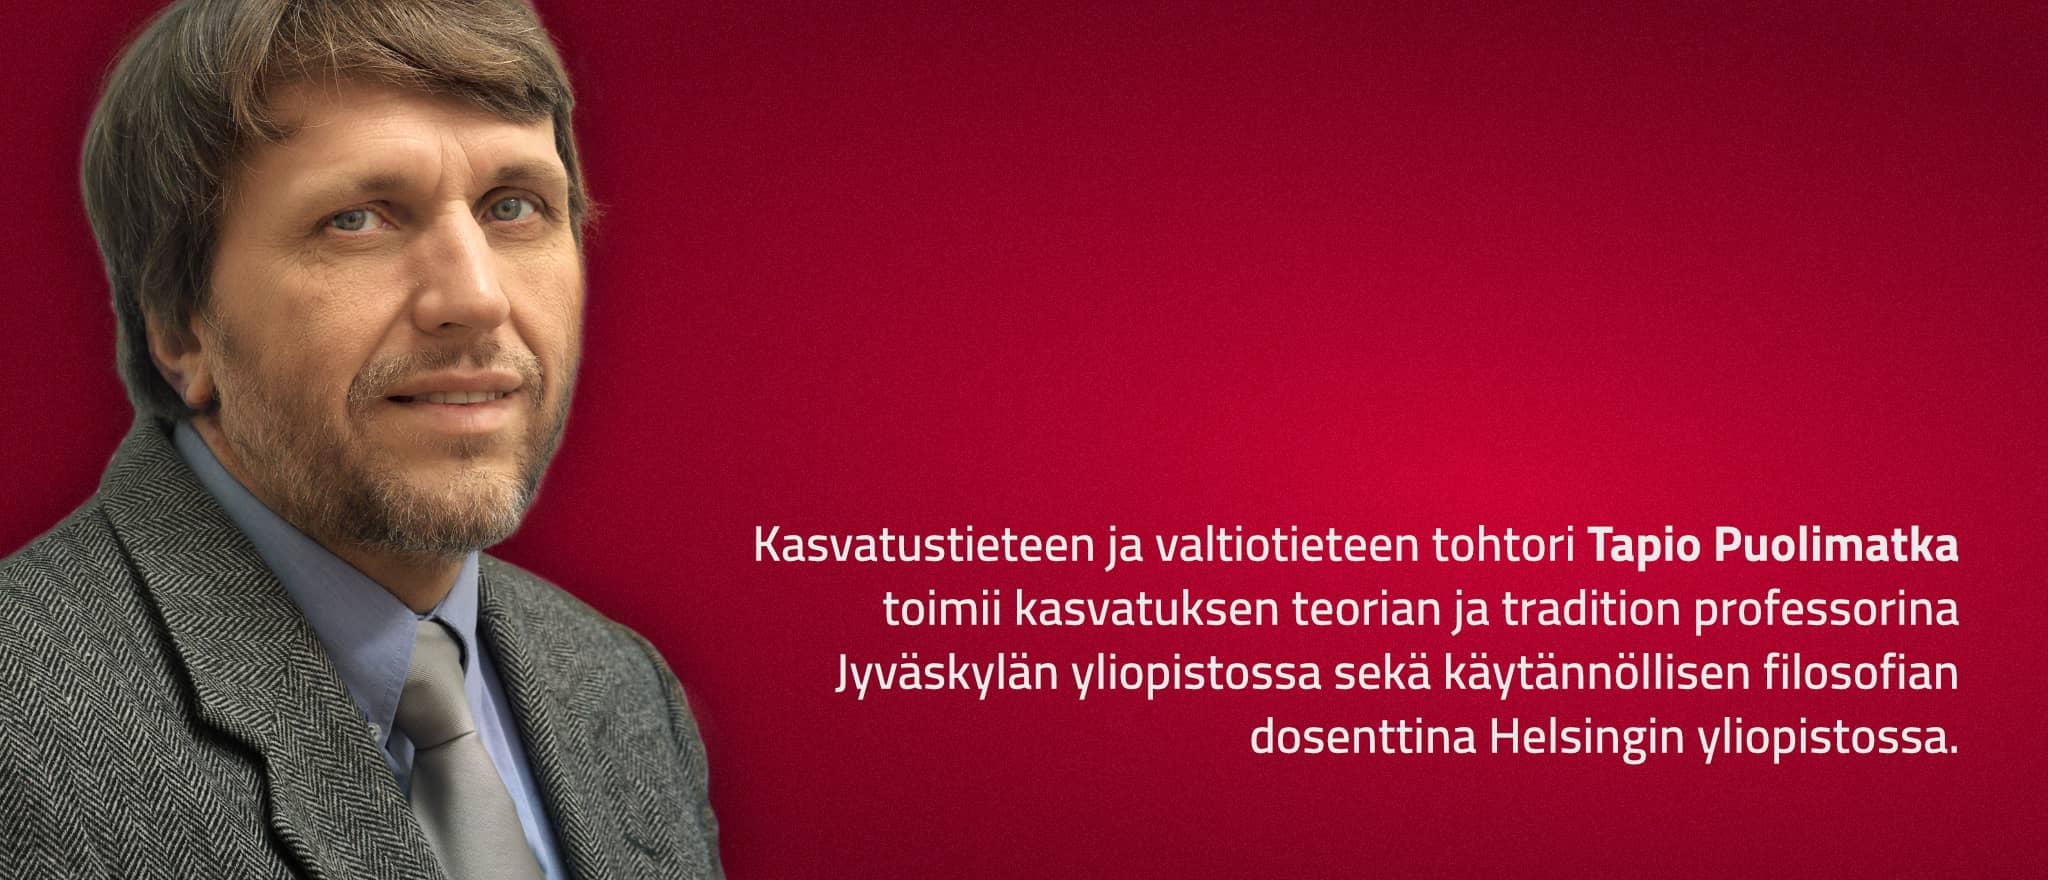 Tapio Puolimatka